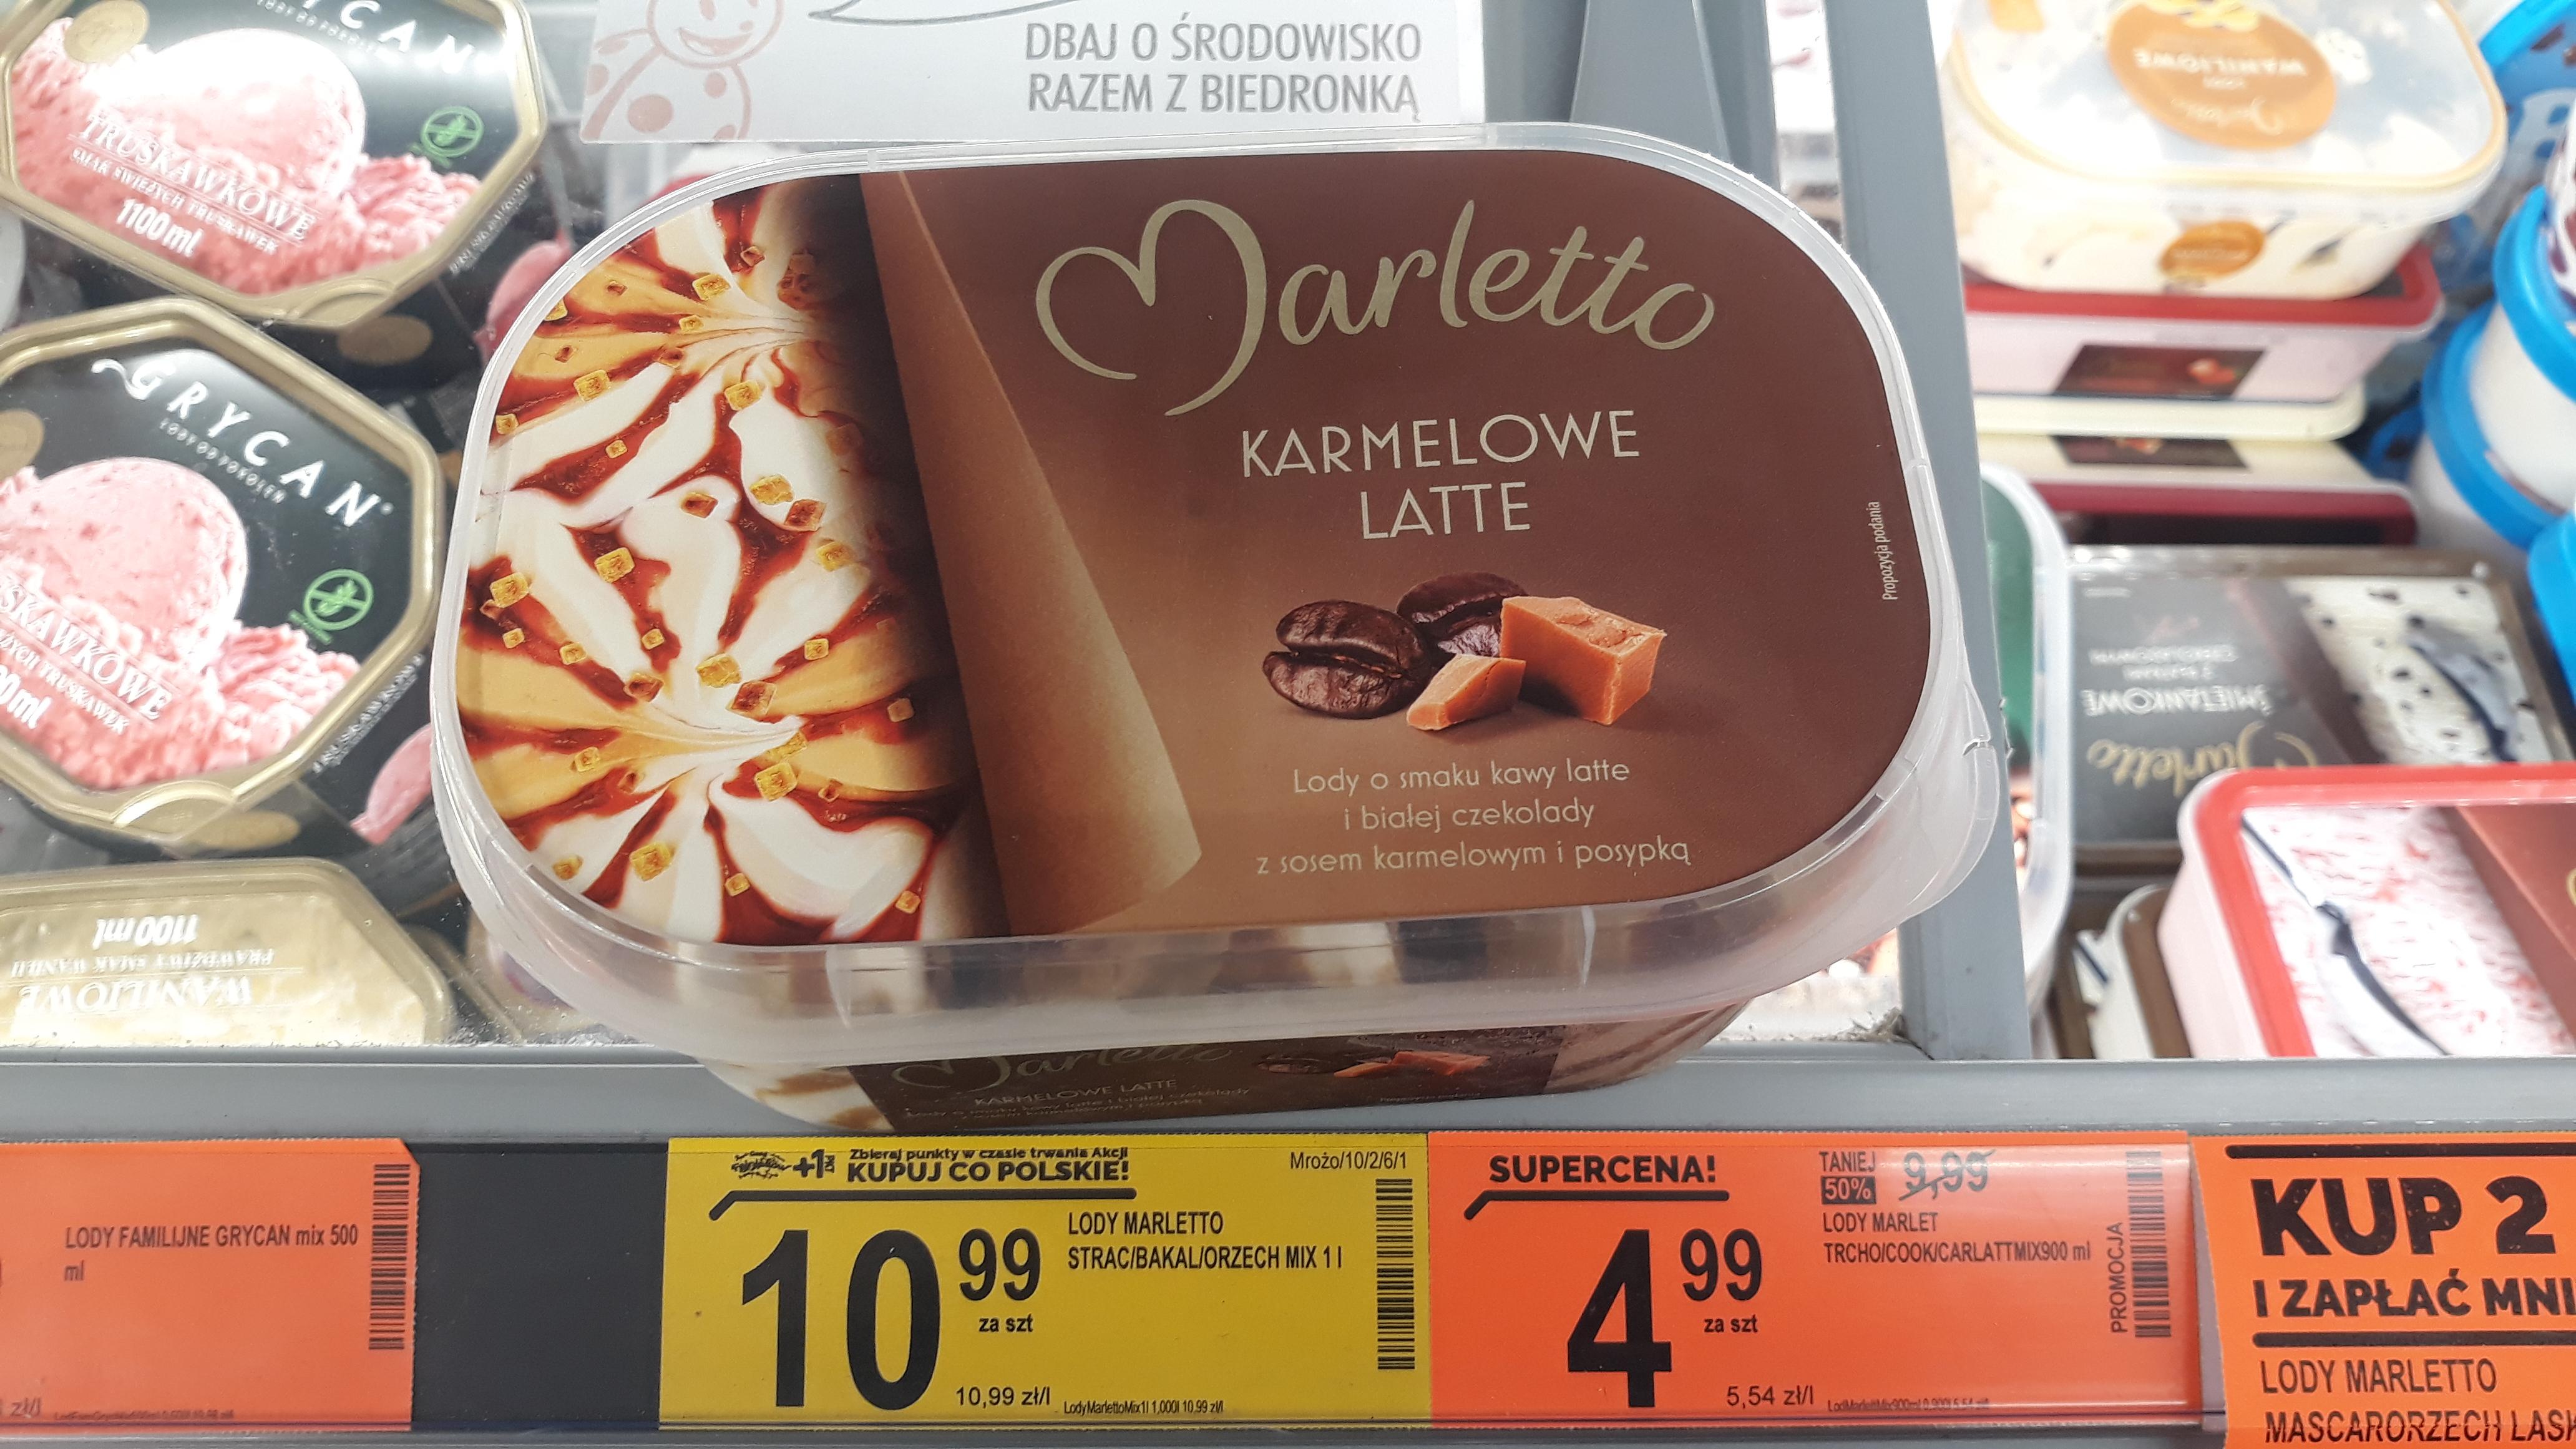 Lody Marletto karmelowe latte 900 ml